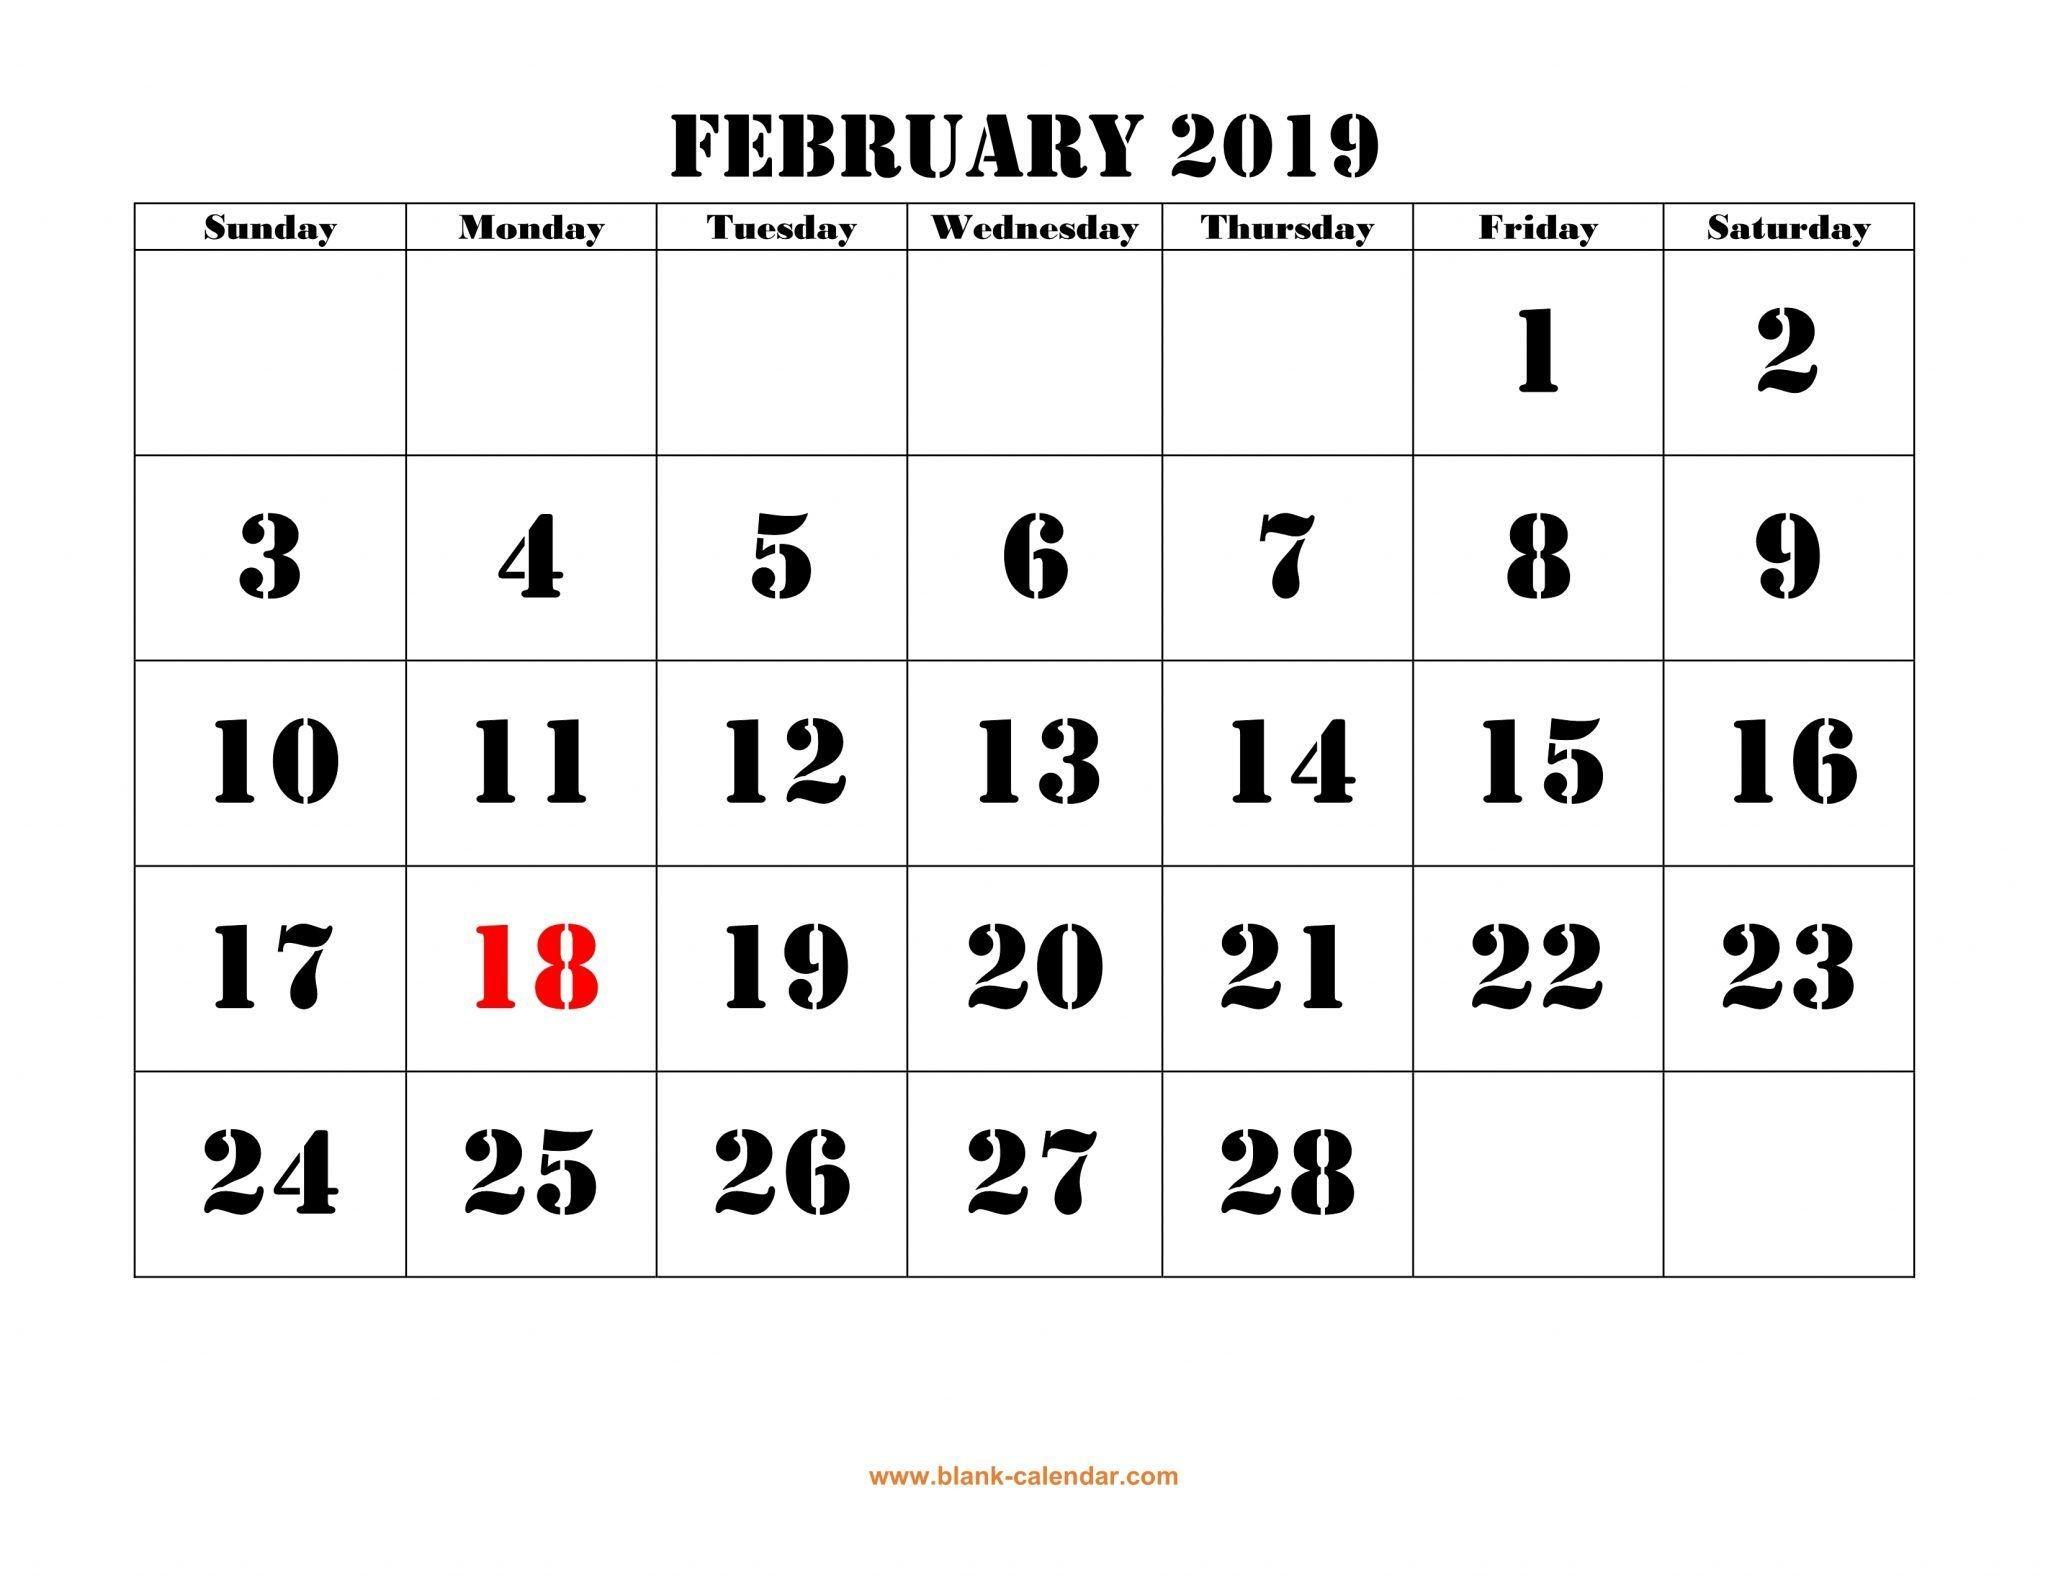 Empty March Calendar Más Populares February 2019 Calendar Template Pdf February February2019 Of Empty March Calendar Más Actual the Ideal Instance E S Blank Calendar Templates July 2018